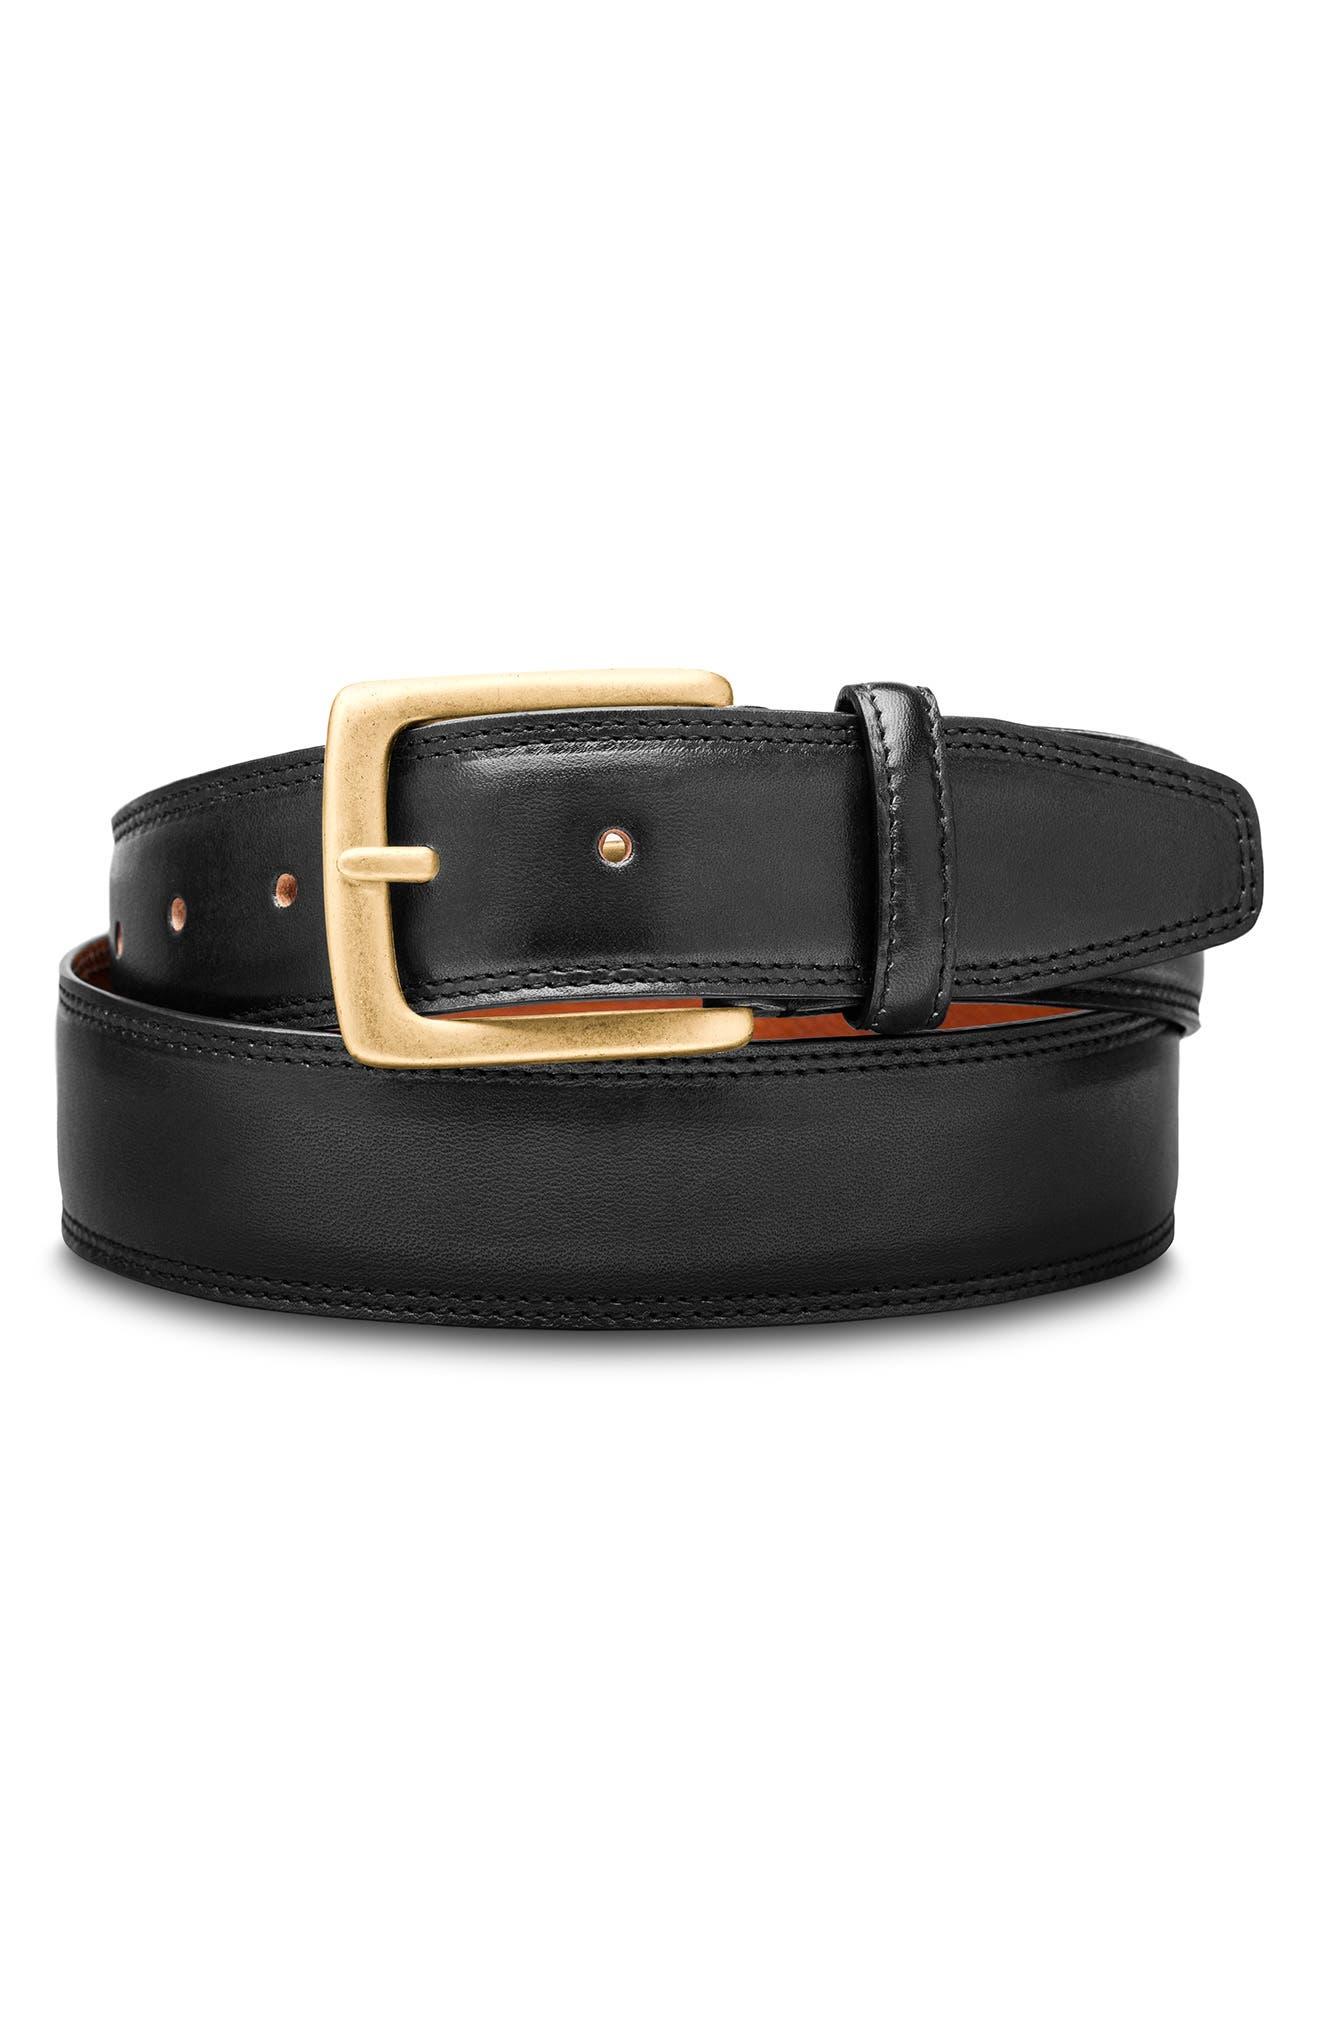 Amalfi Leather Belt